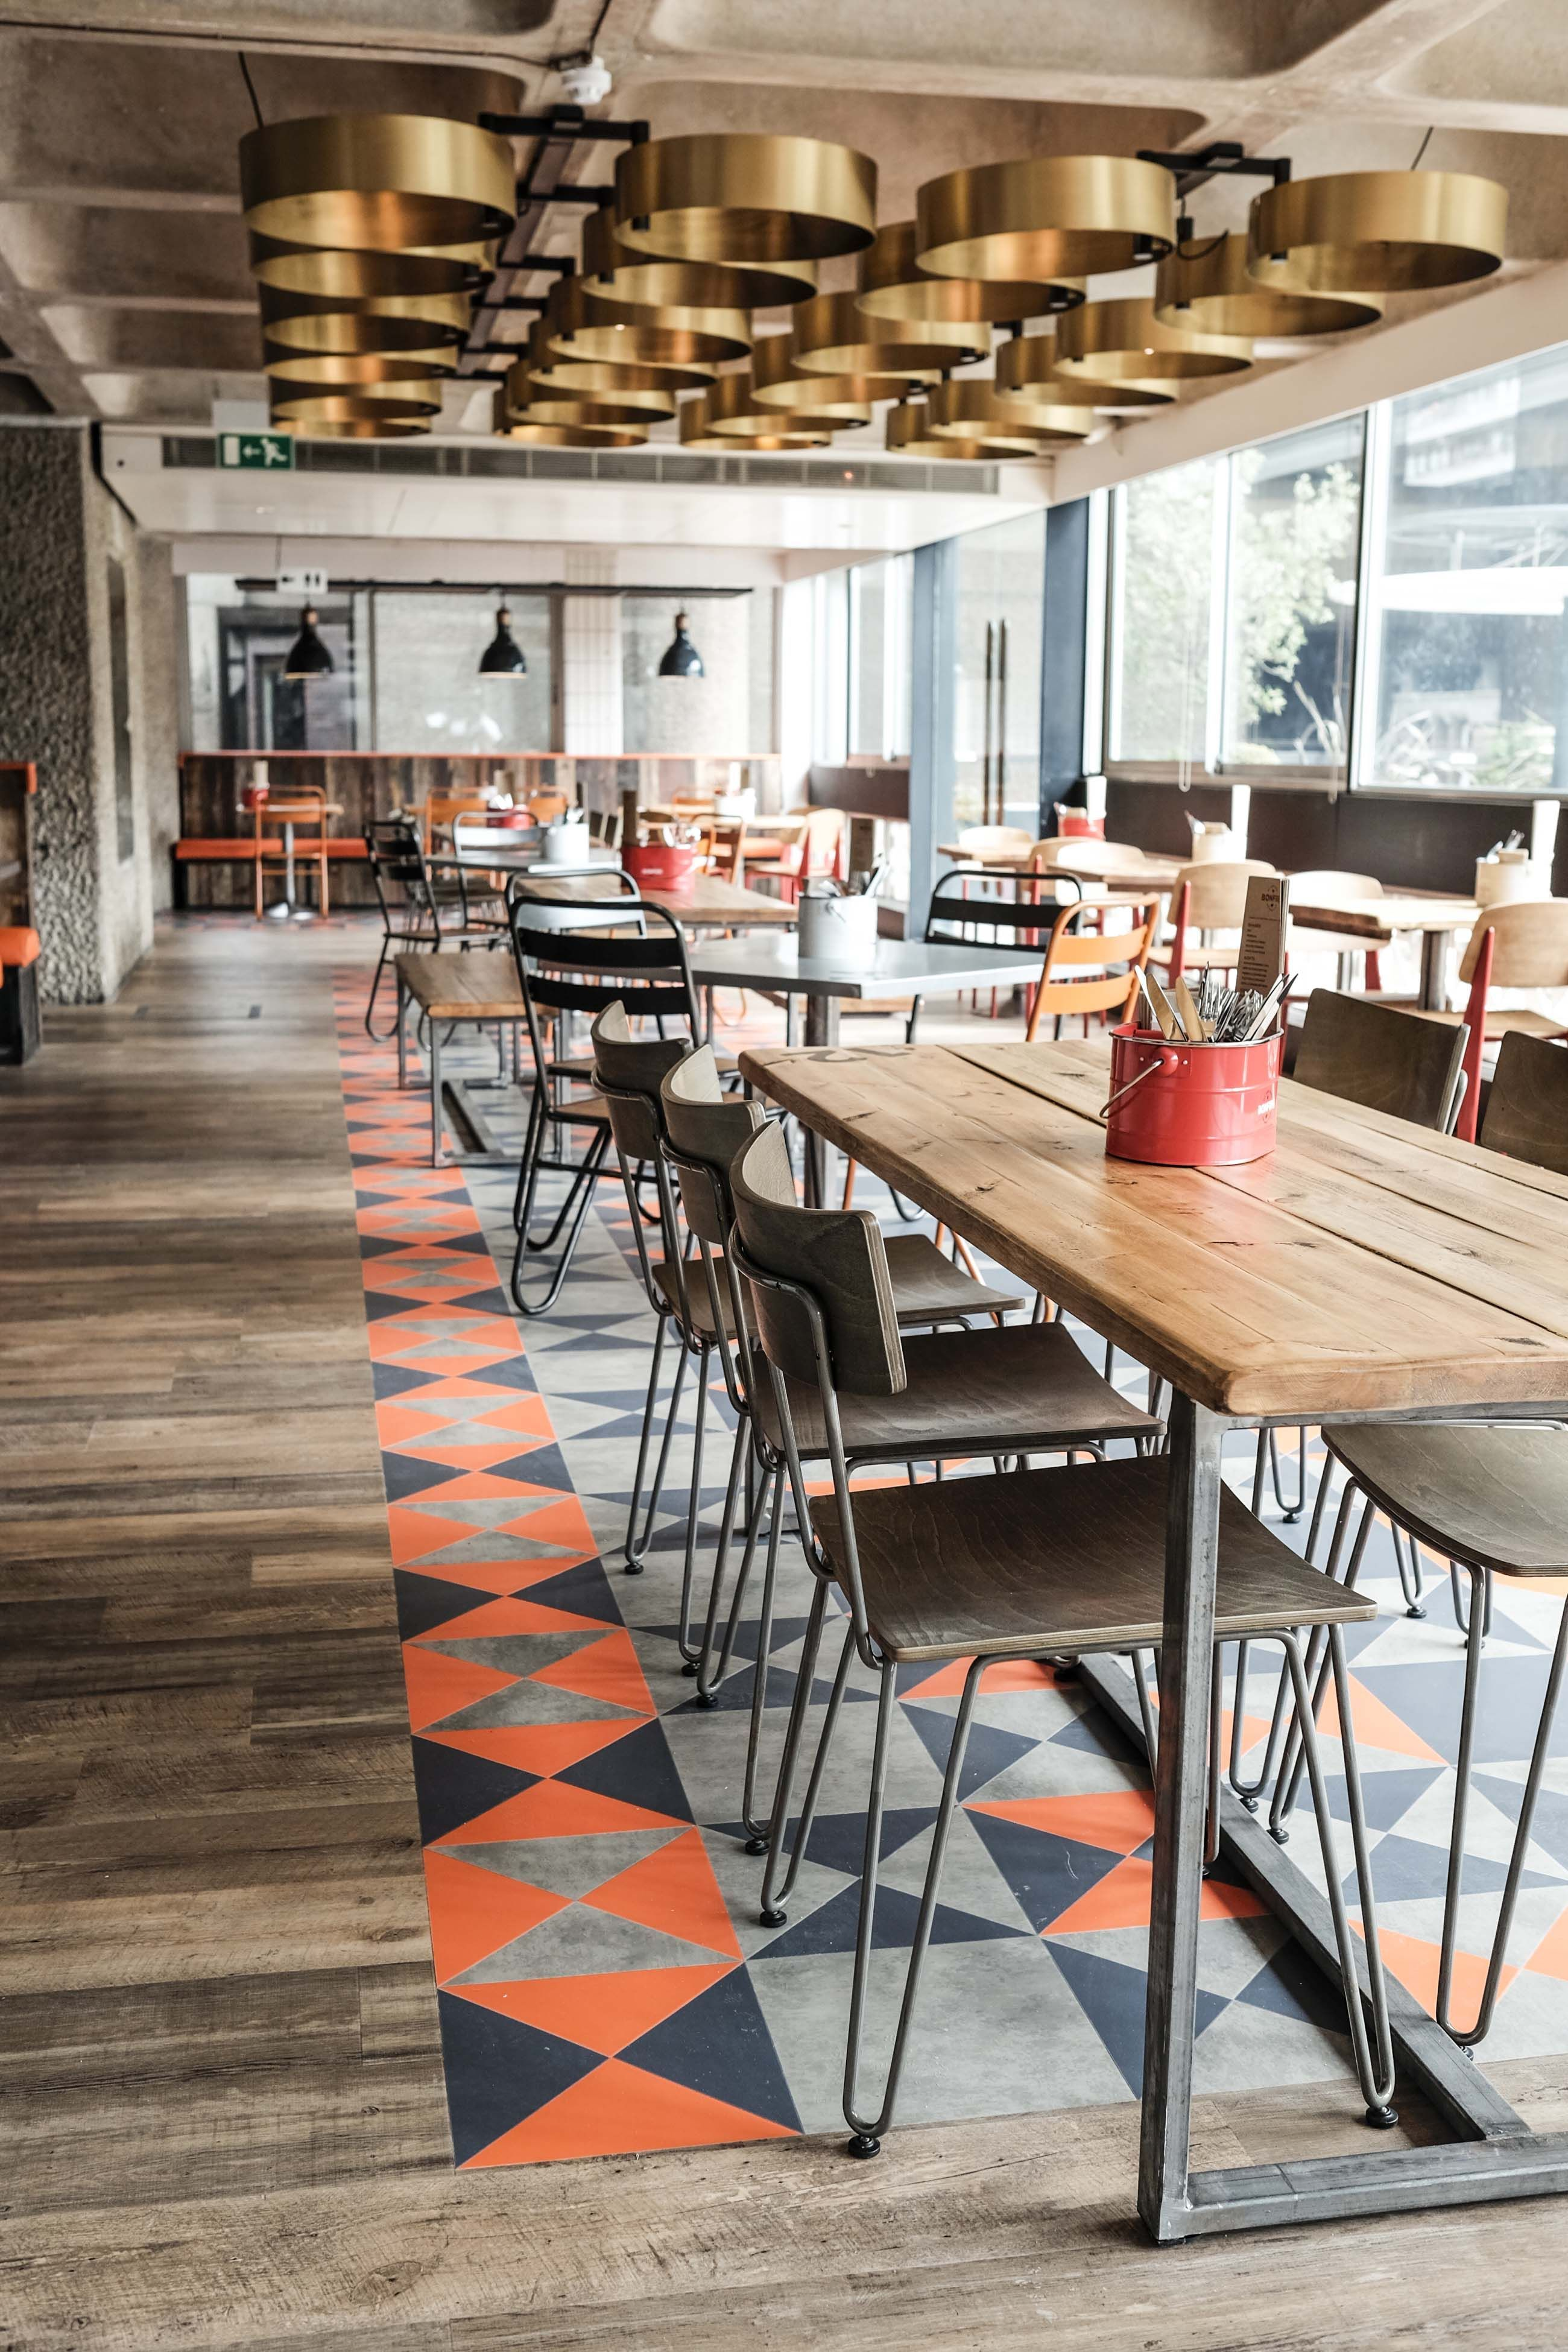 Bonfire Restaurant @ The Barbican Centre, London. Designed by ...